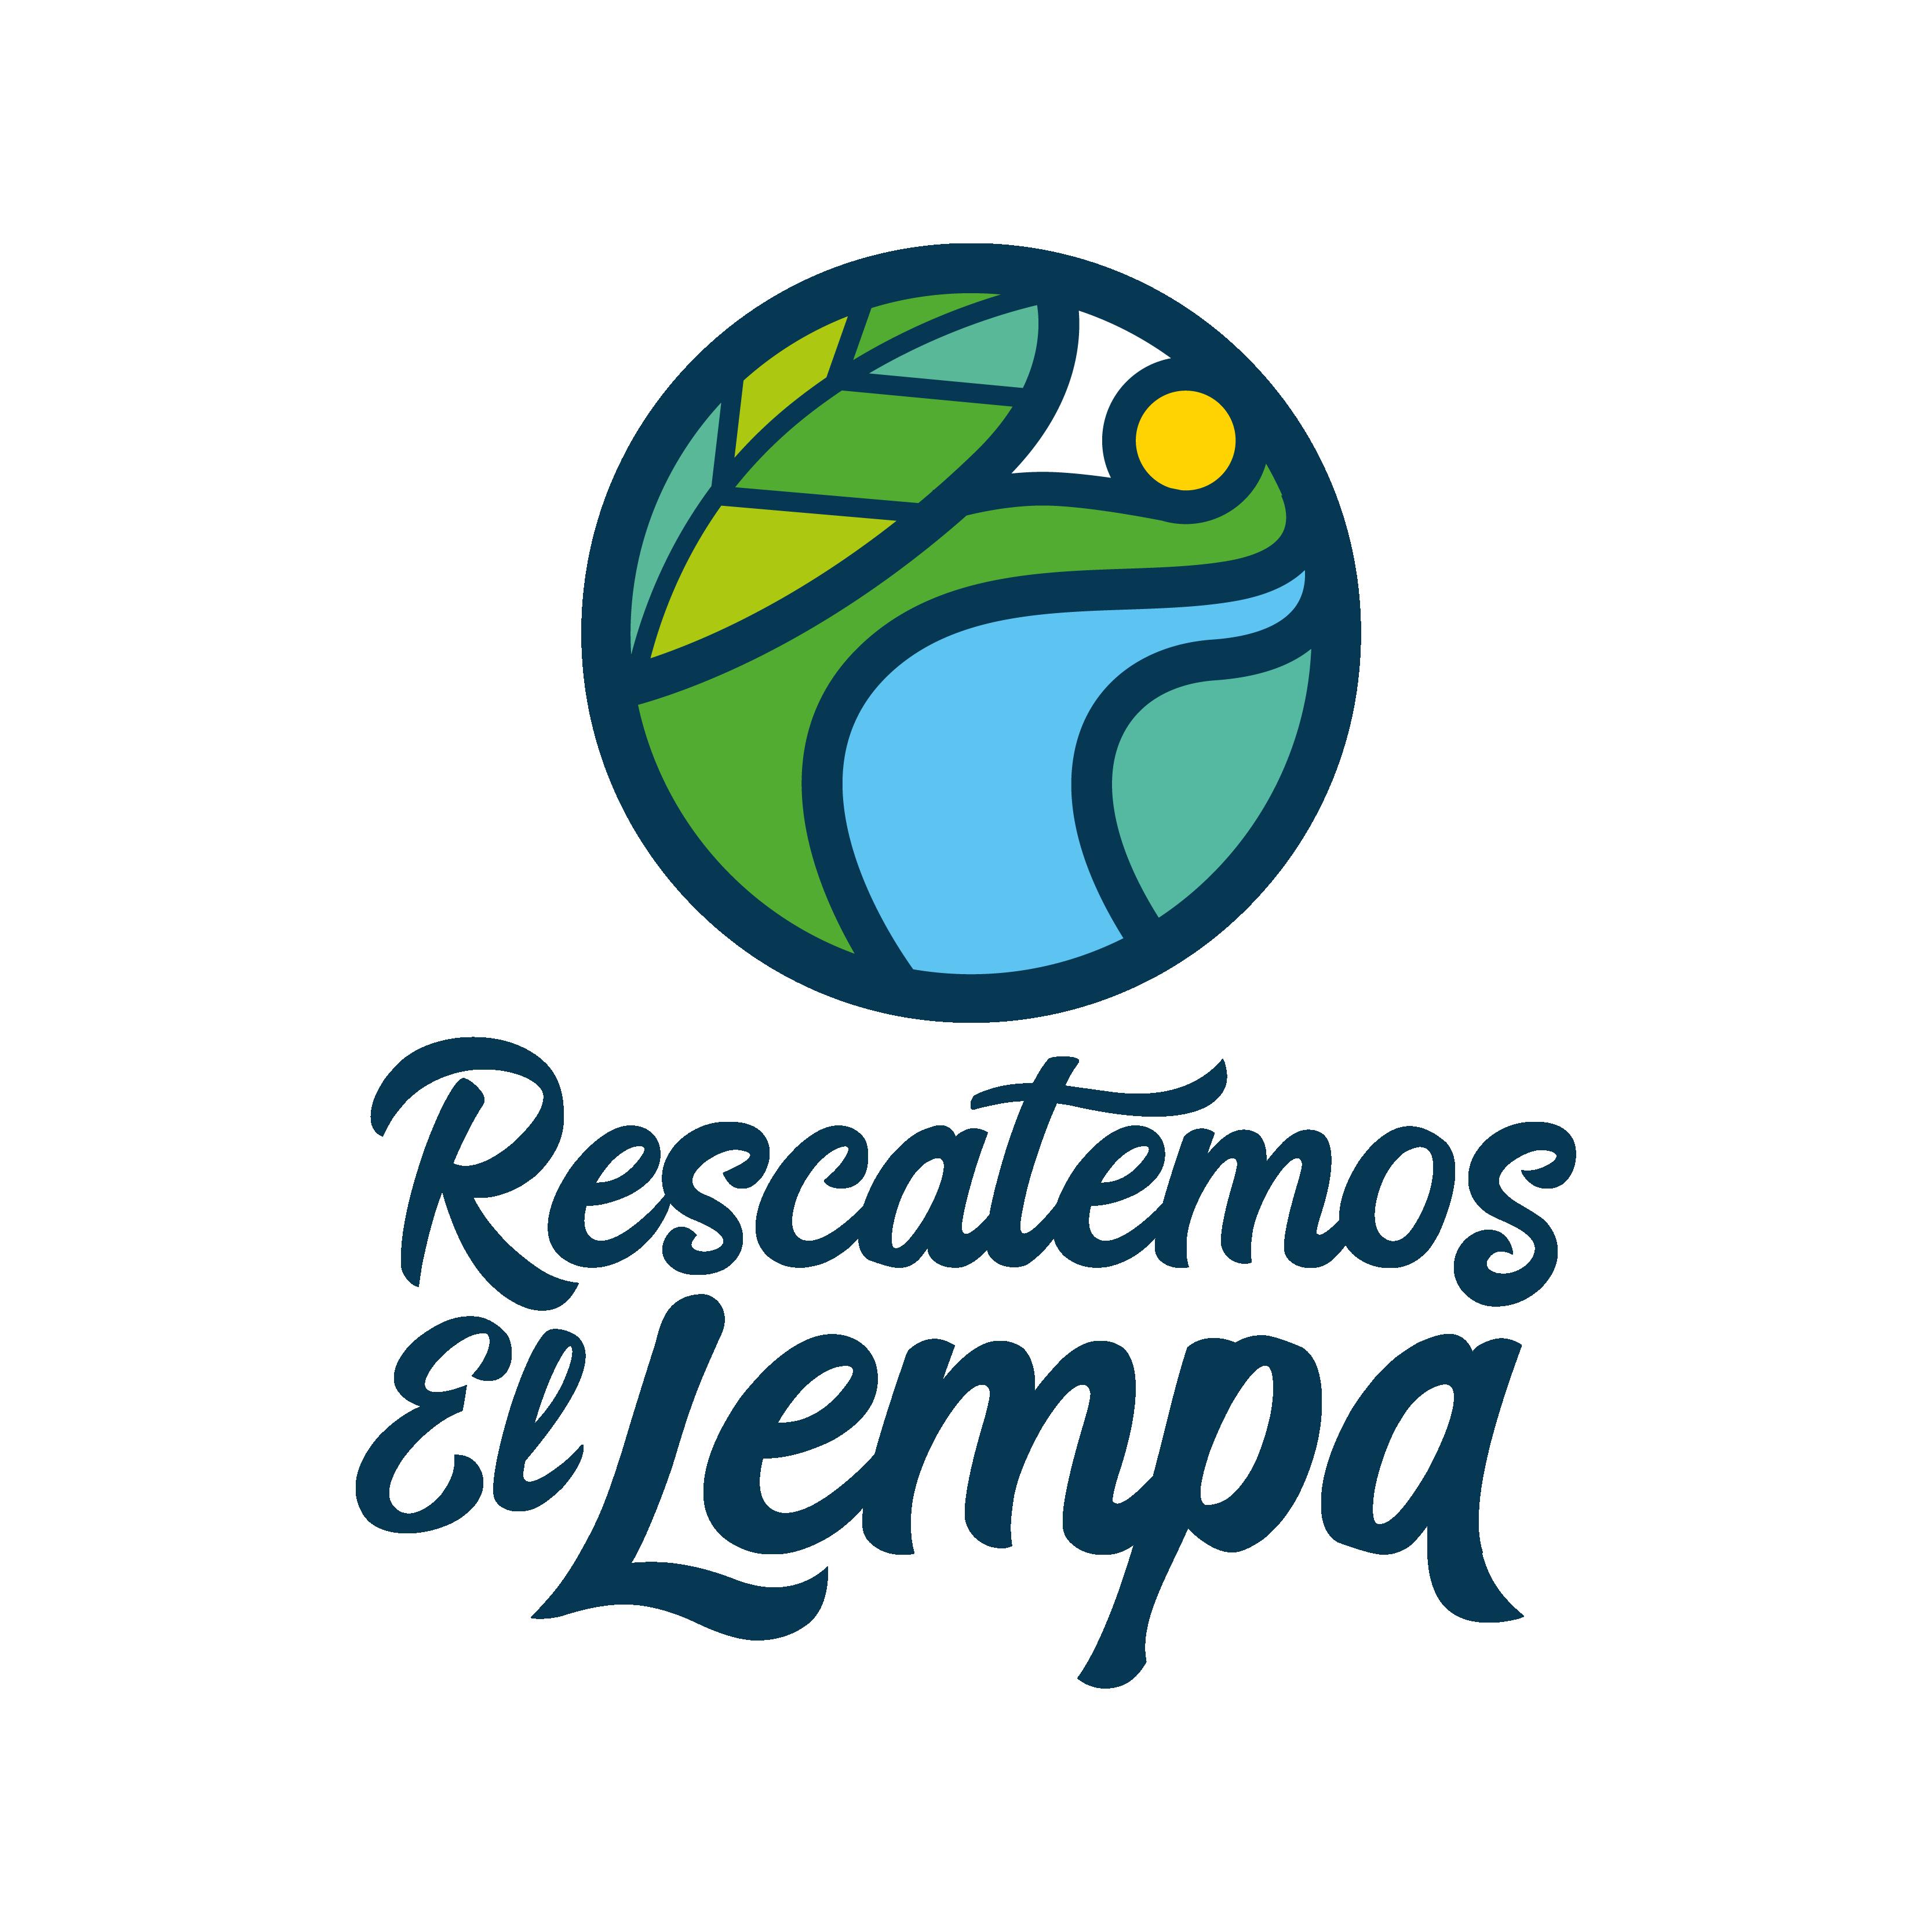 #RescatemosElLempa